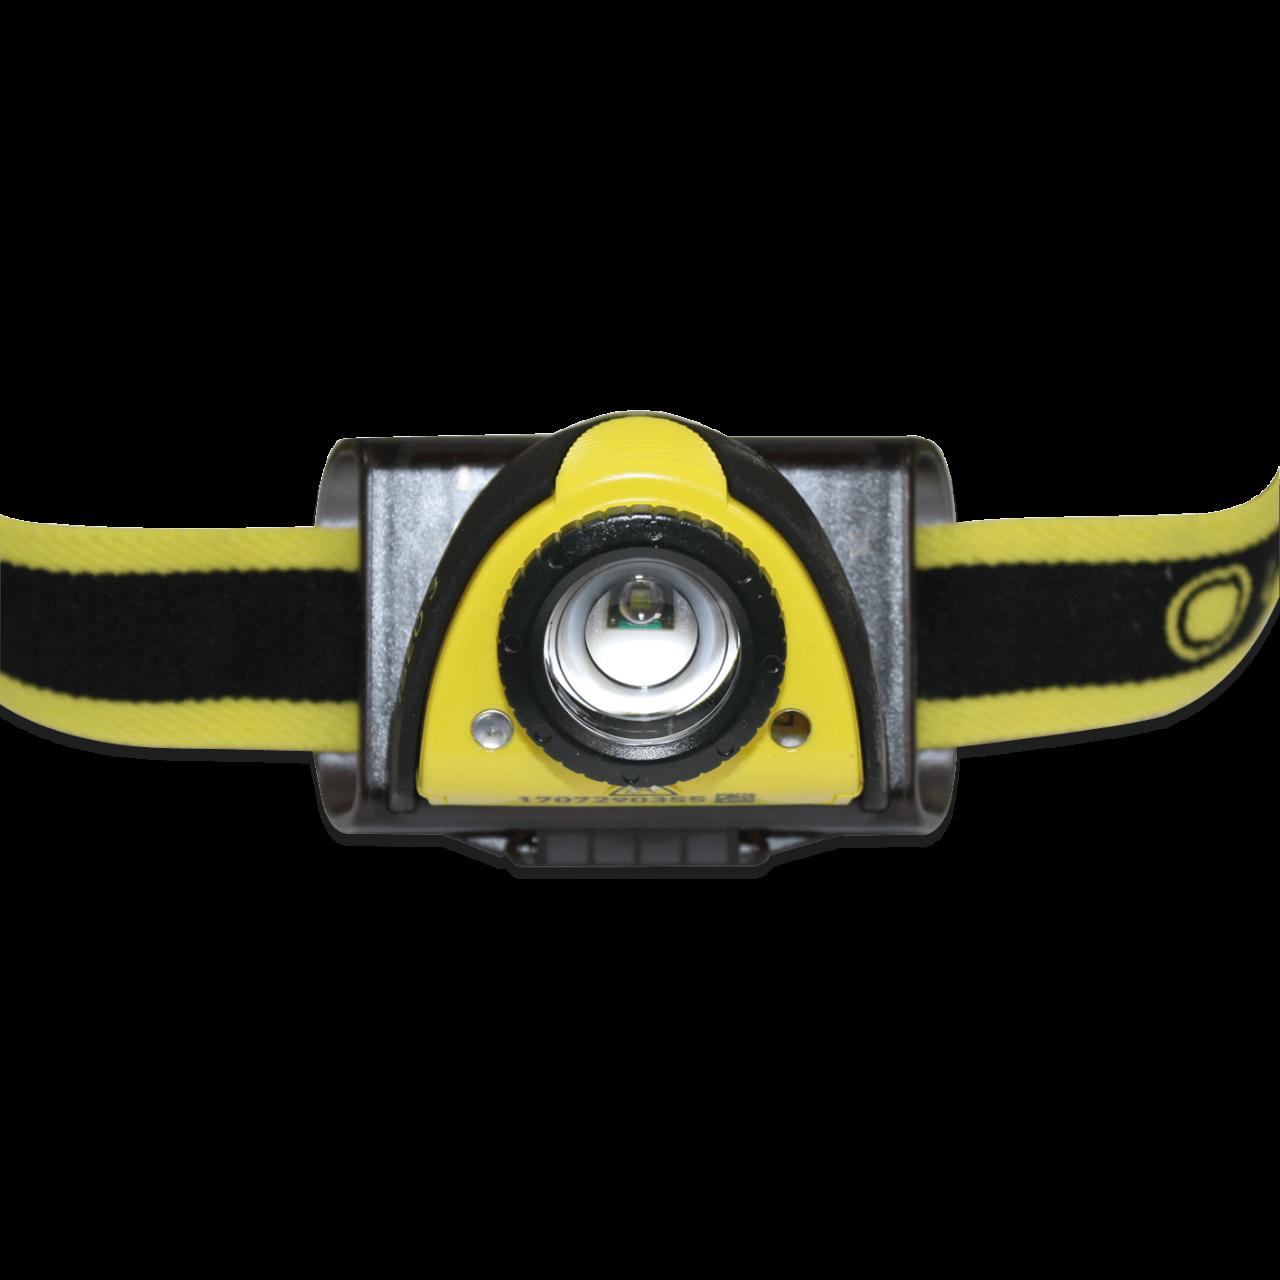 Kopflampe Bild 3